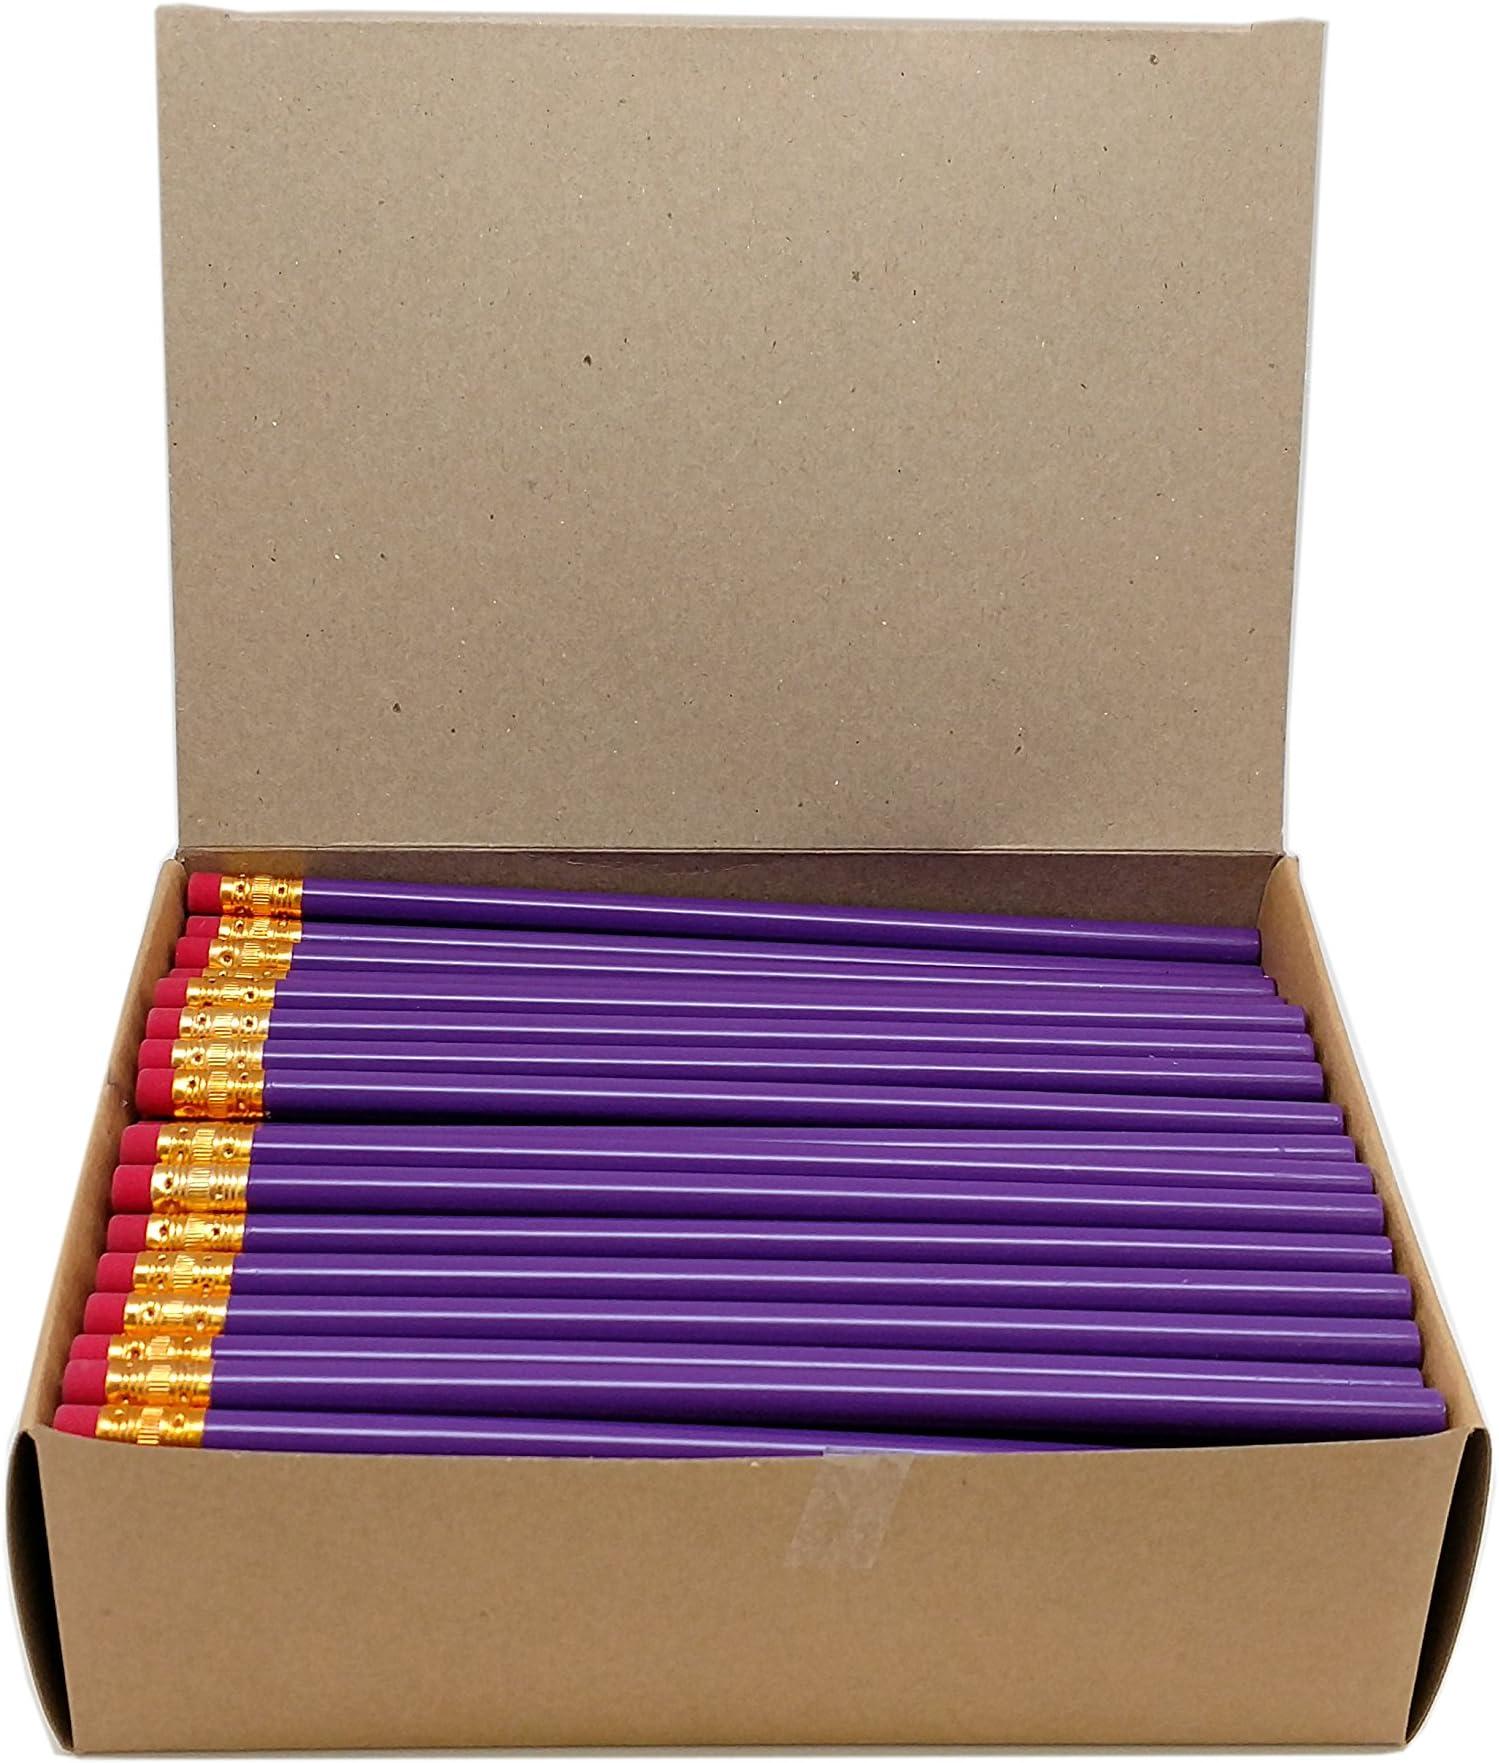 Impex Round Wood #2 HB Pencils (4 Gross, Bulk Lot of 576pcs, Classroom Set) (Purple)